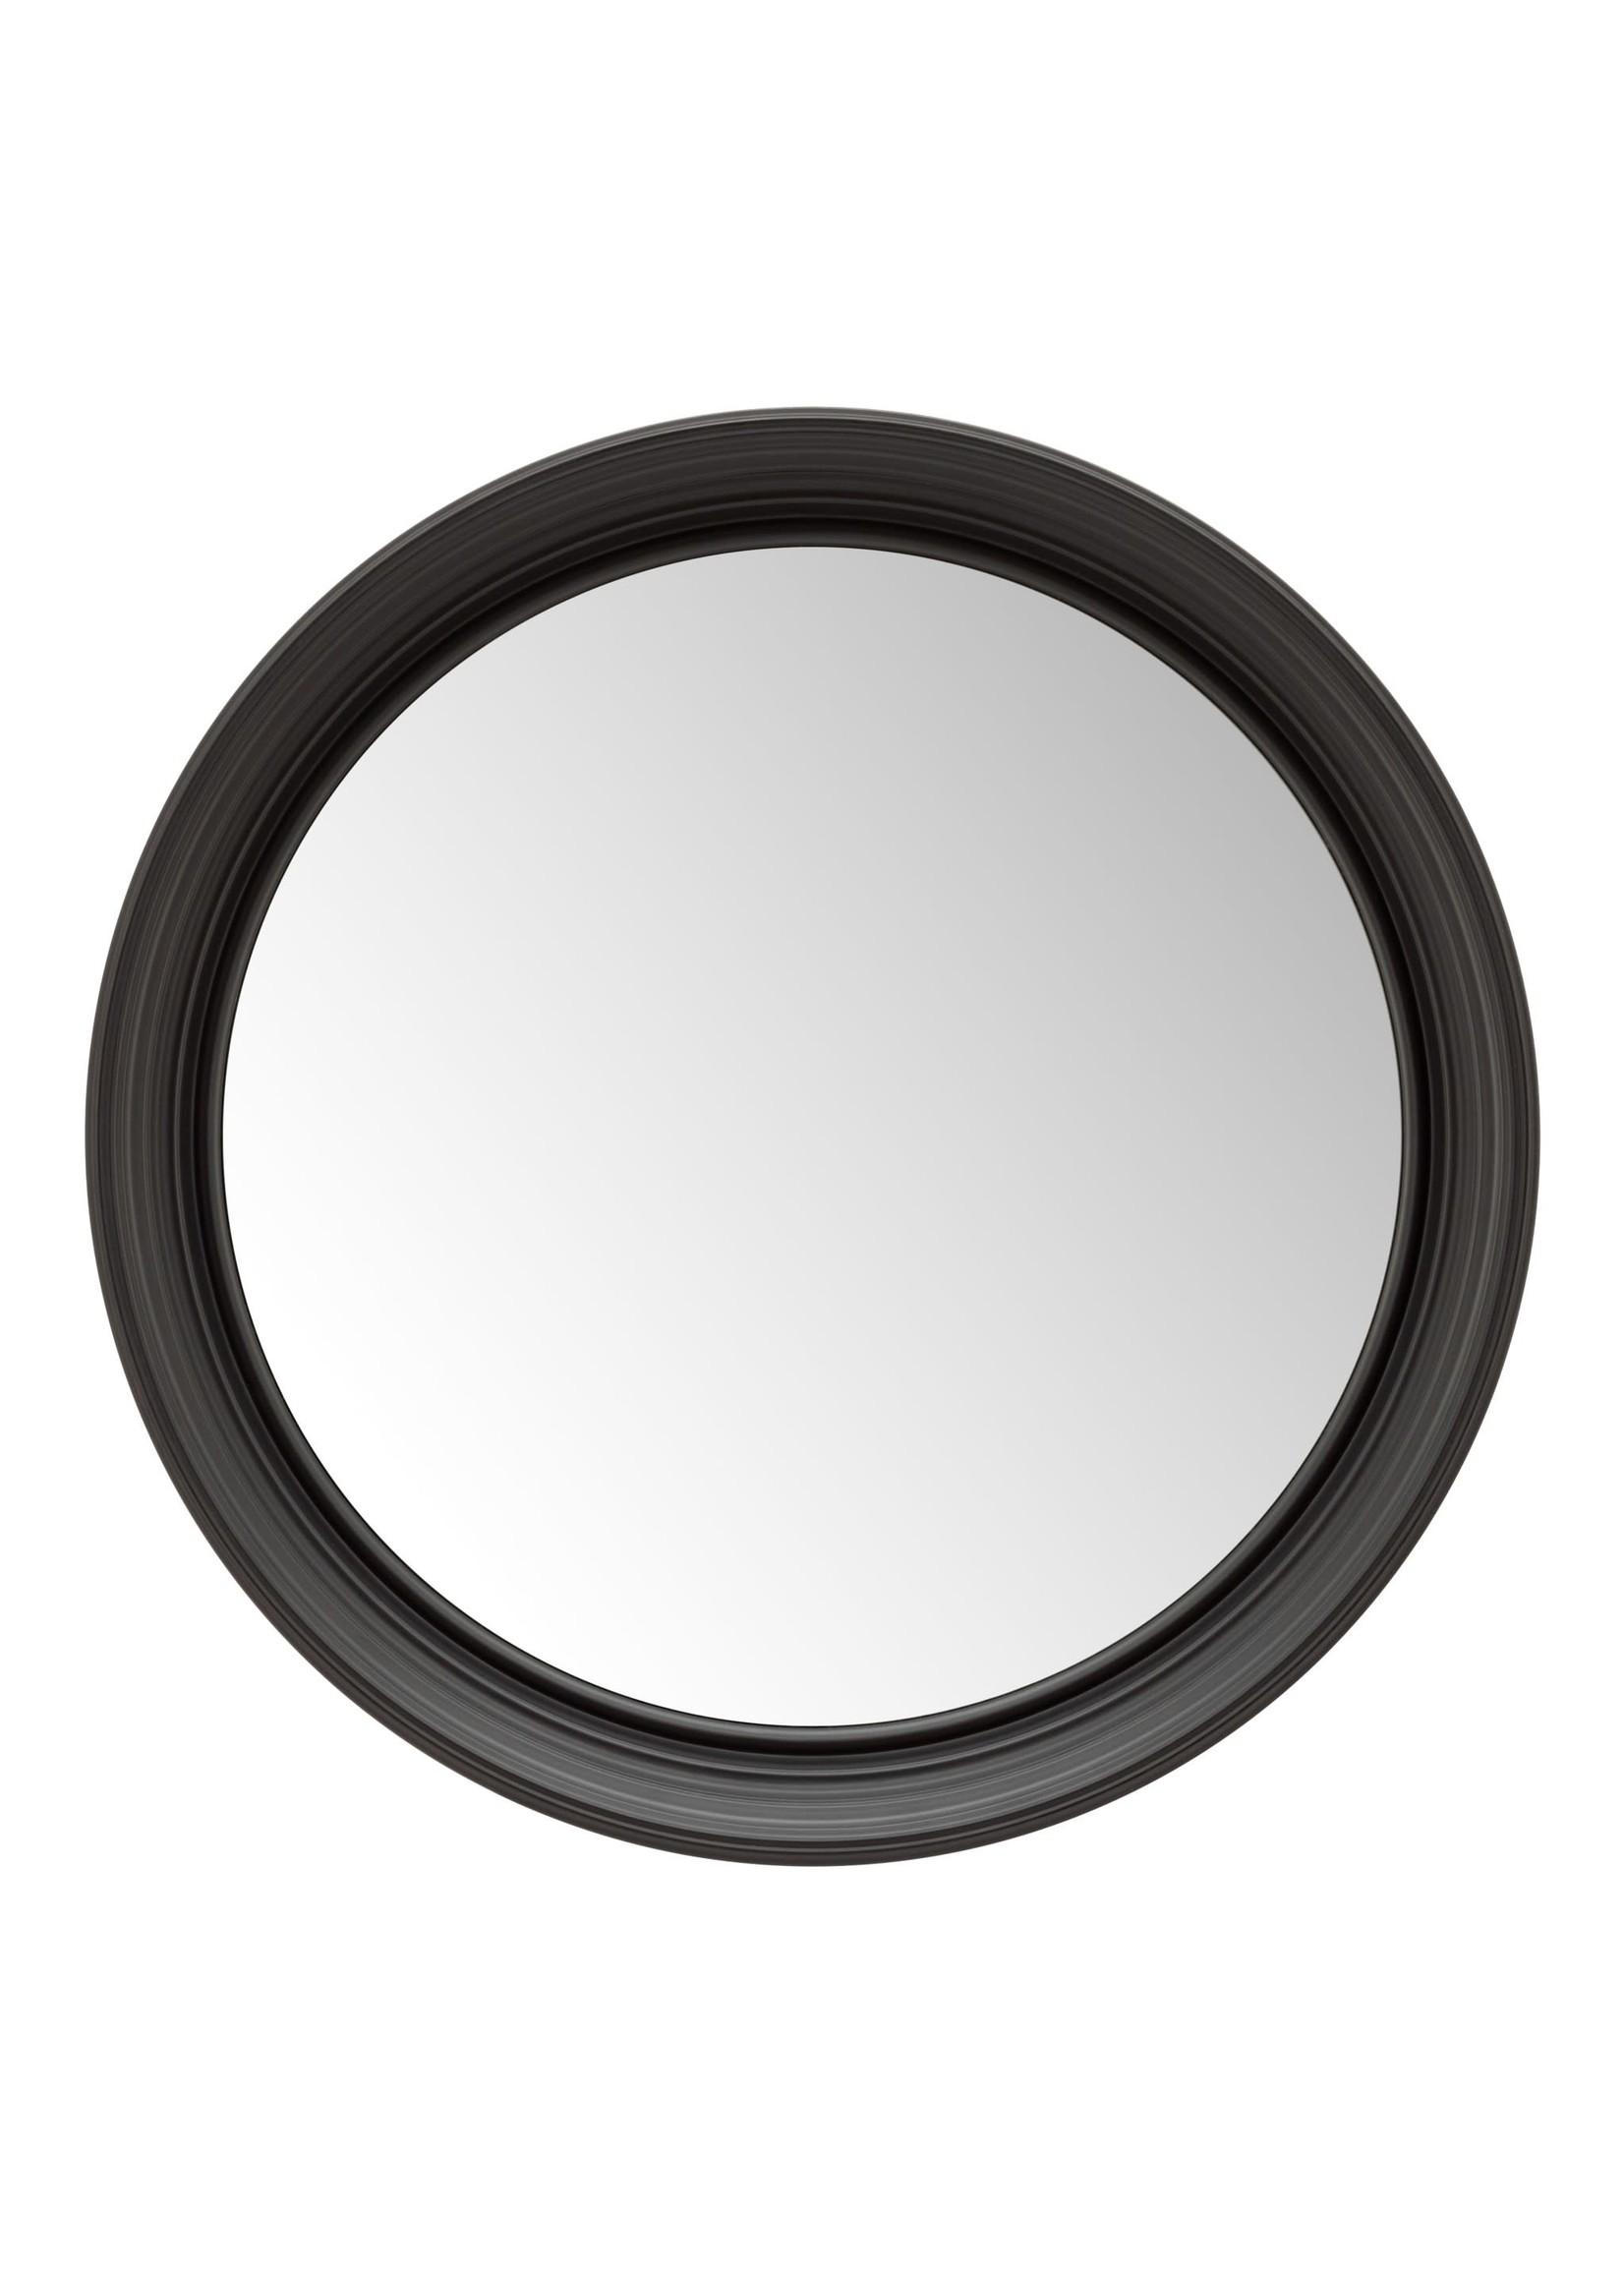 Torre & Tagus Bevelled Frame Round Mirror - Black